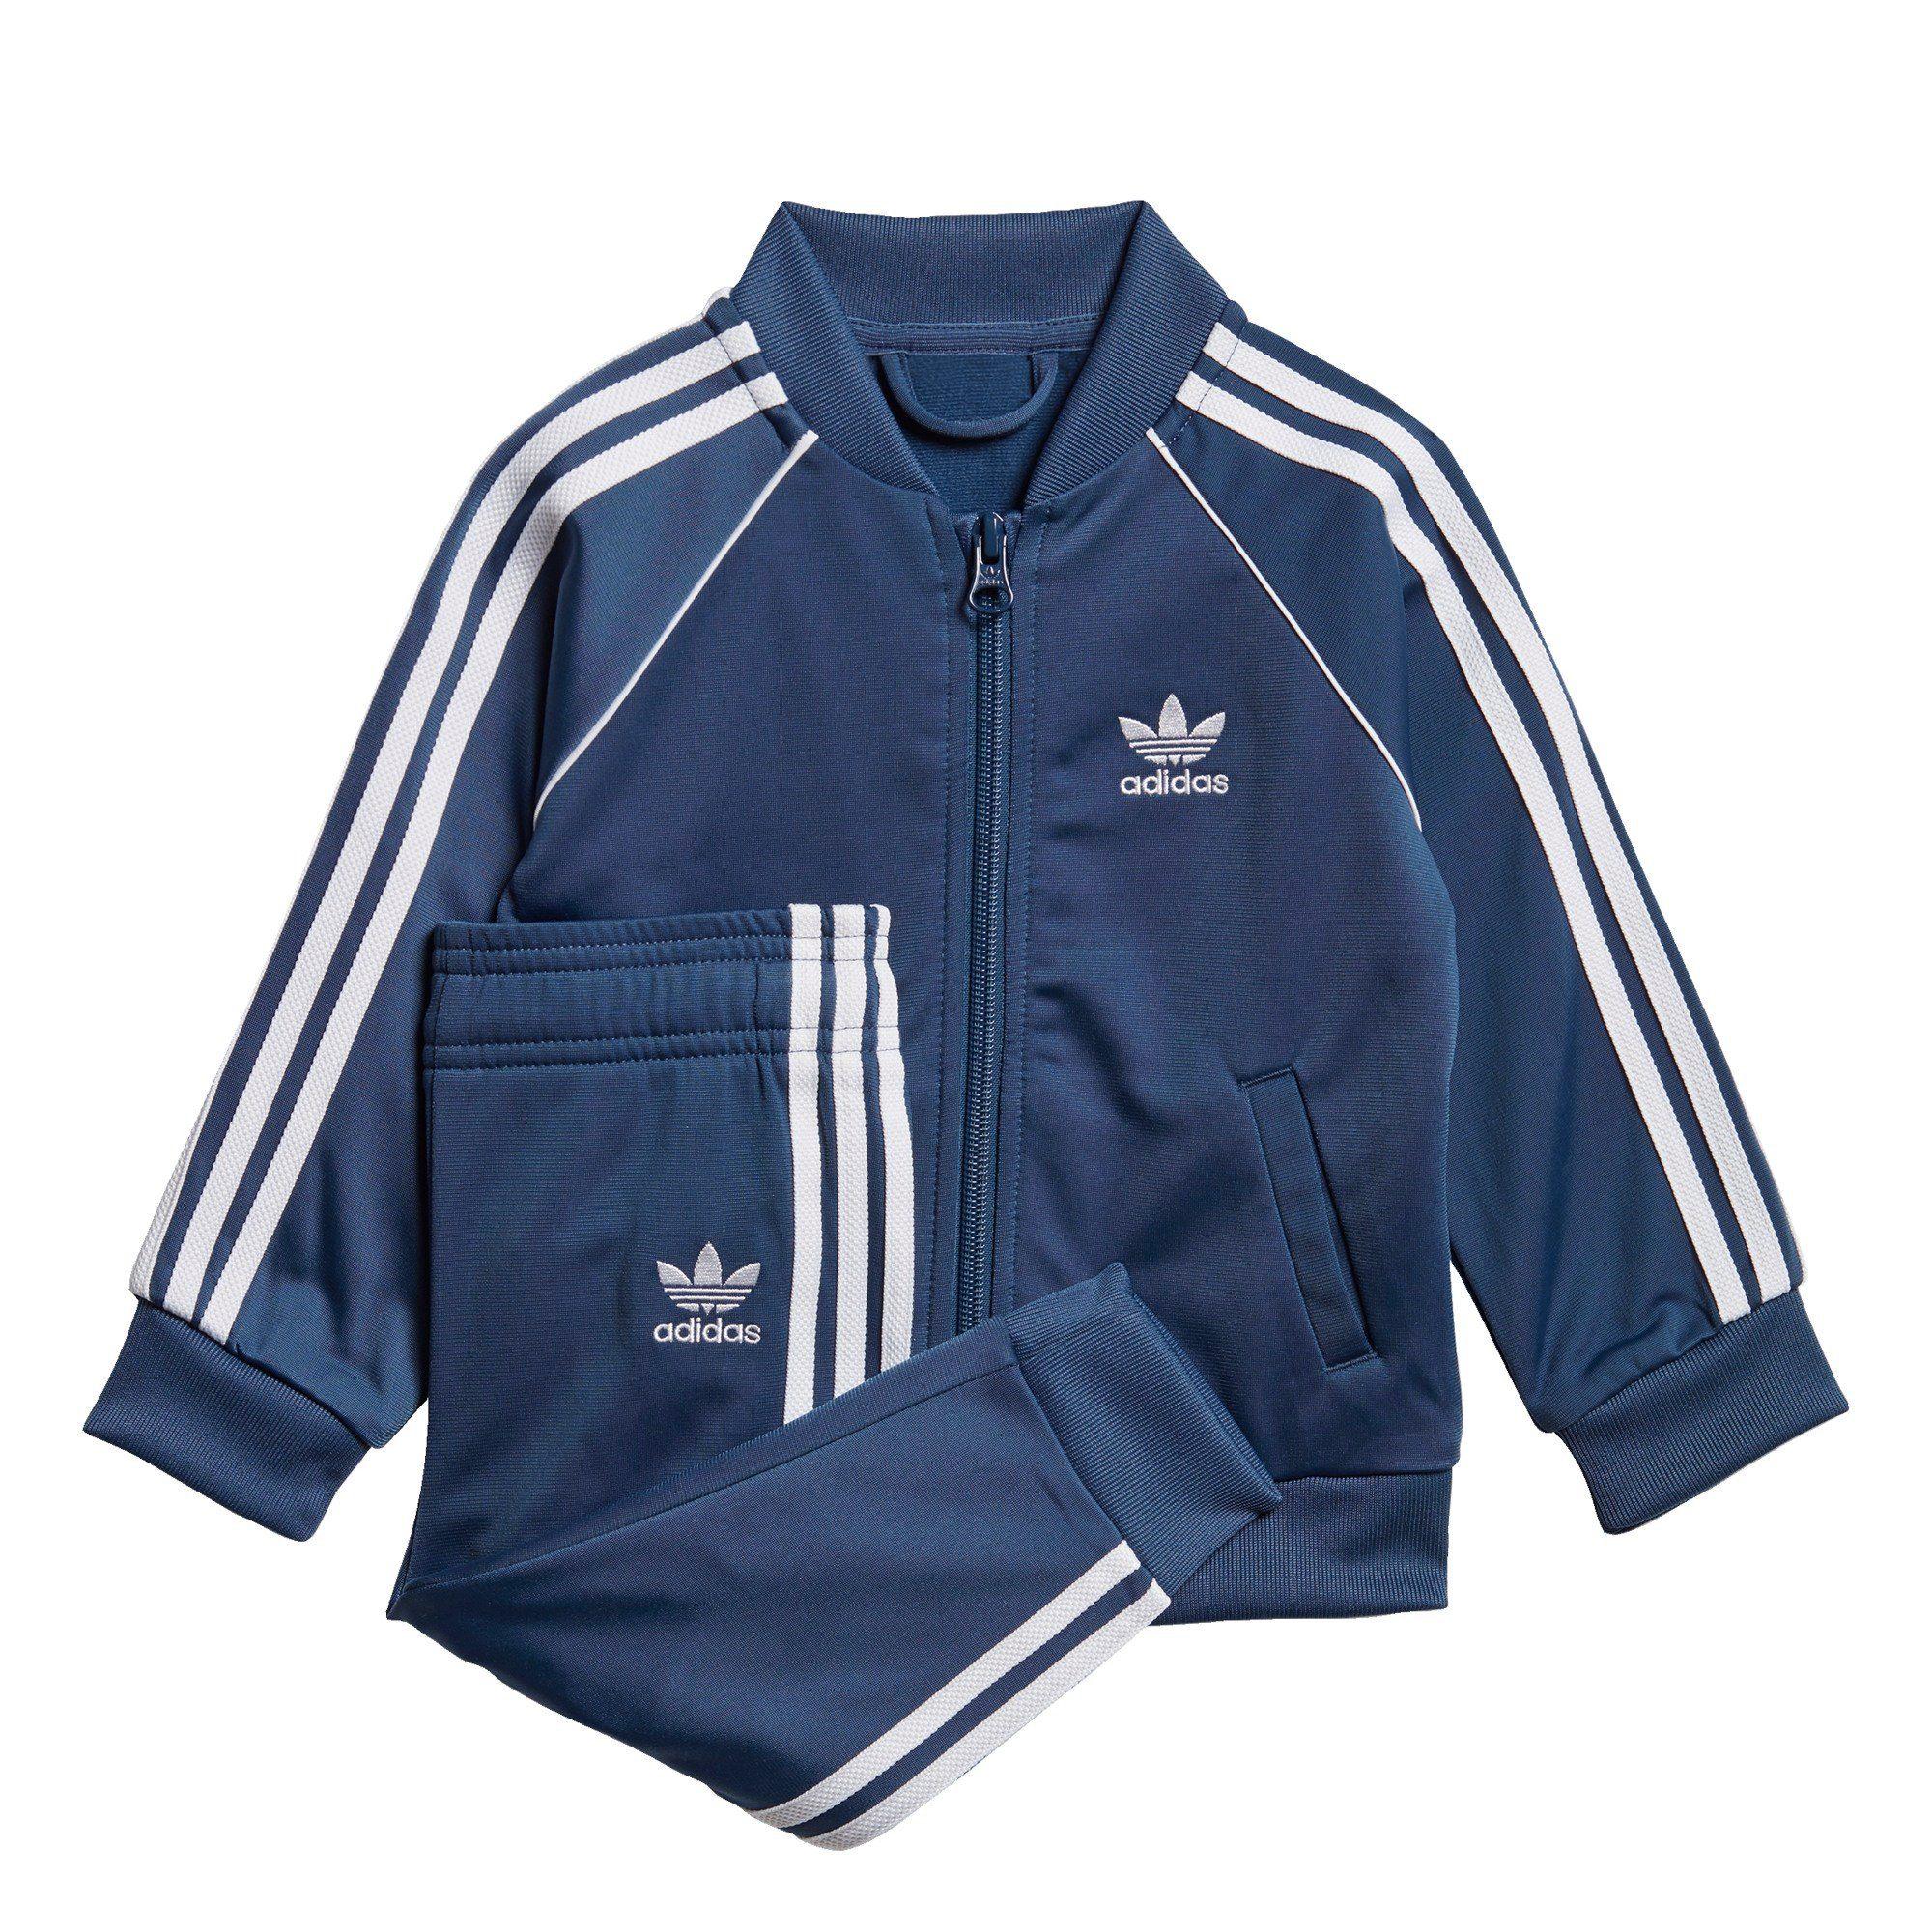 adidas Originals Trainingsanzug »SST Trainingsanzug«, adicolor;Superstar online kaufen | OTTO